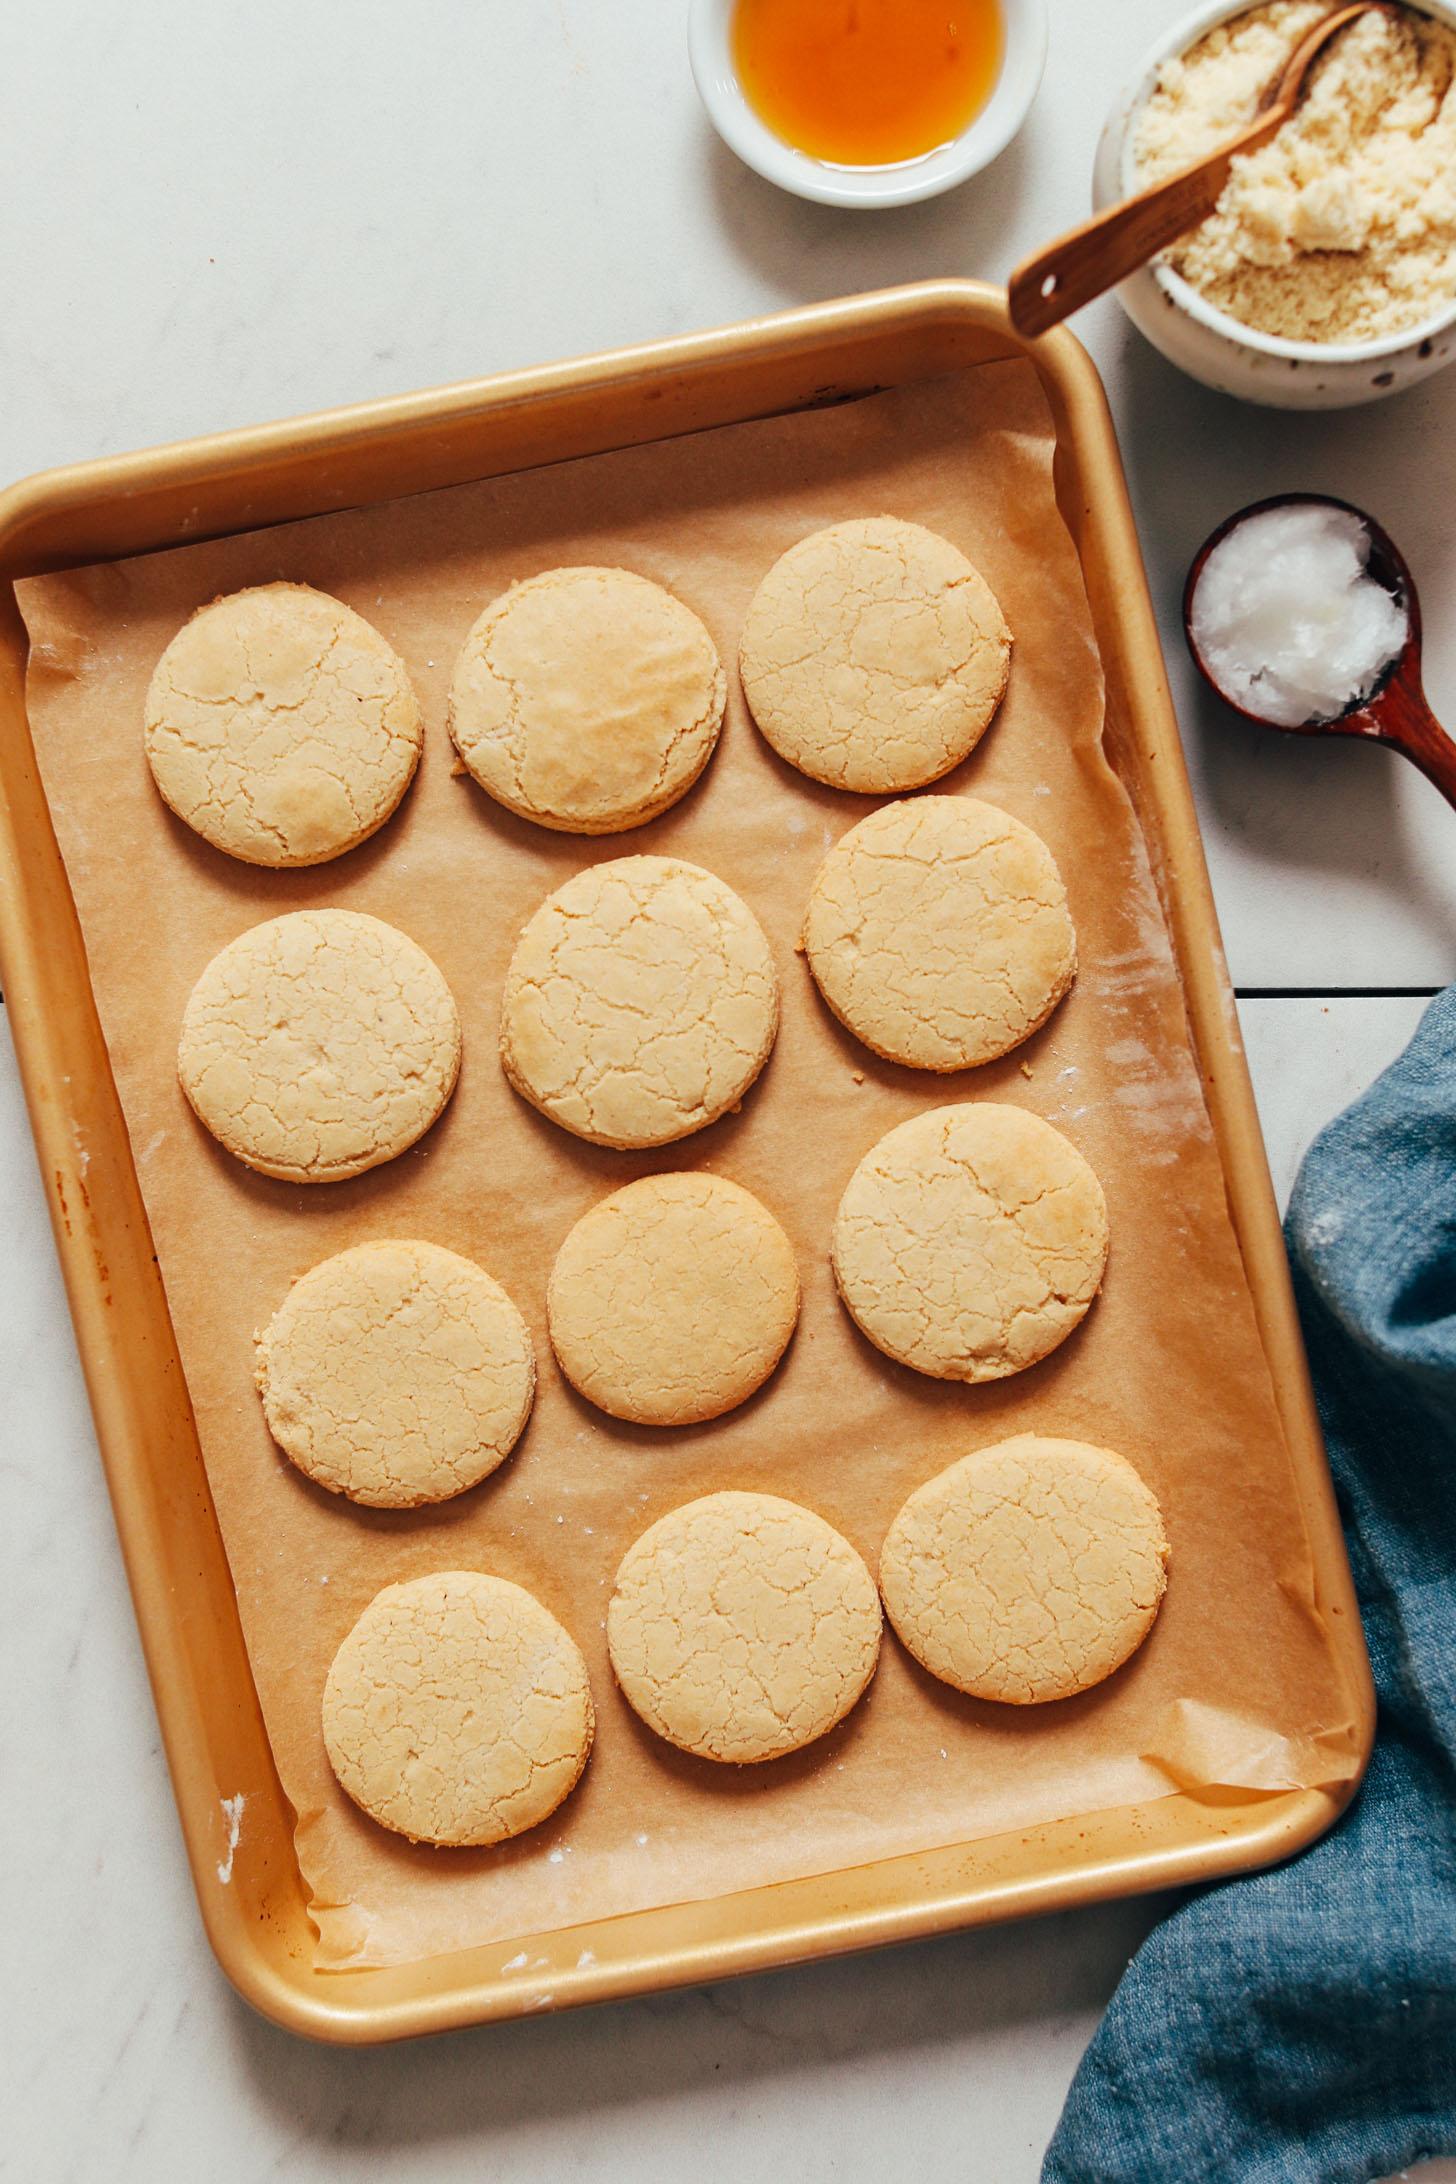 Vegan gluten-free shortbread cookies on a baking sheet